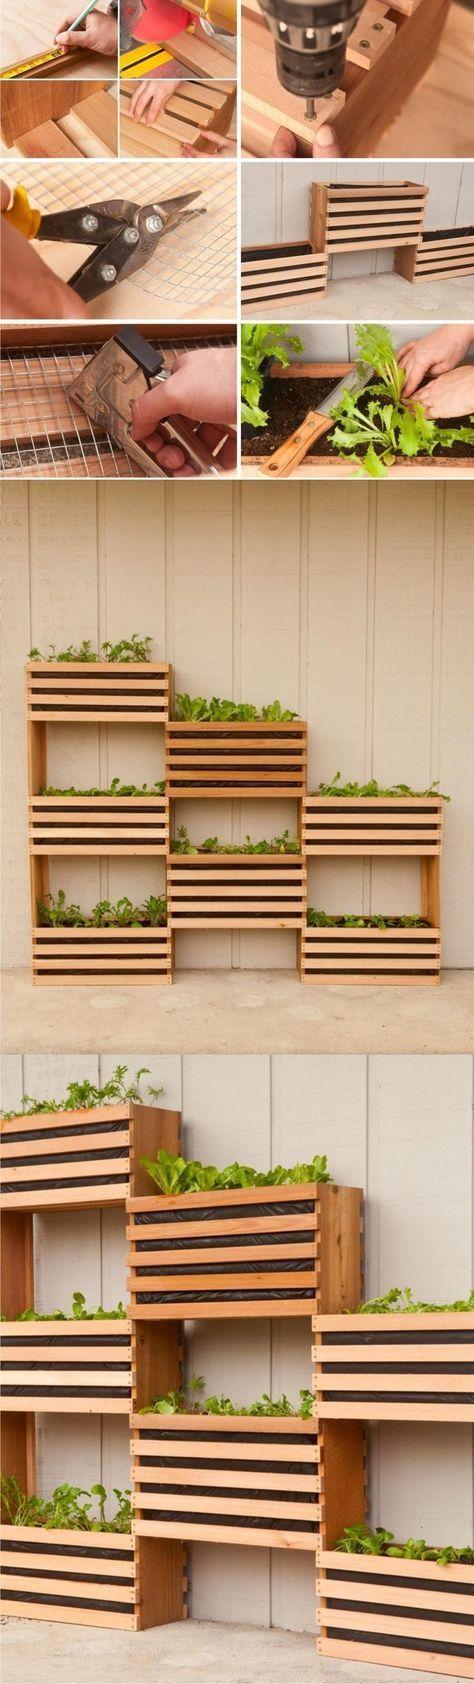 Excellent idea for indoor garden. Space-Saving Vertical Vegetable Garden gardening on a budget #garden #budget